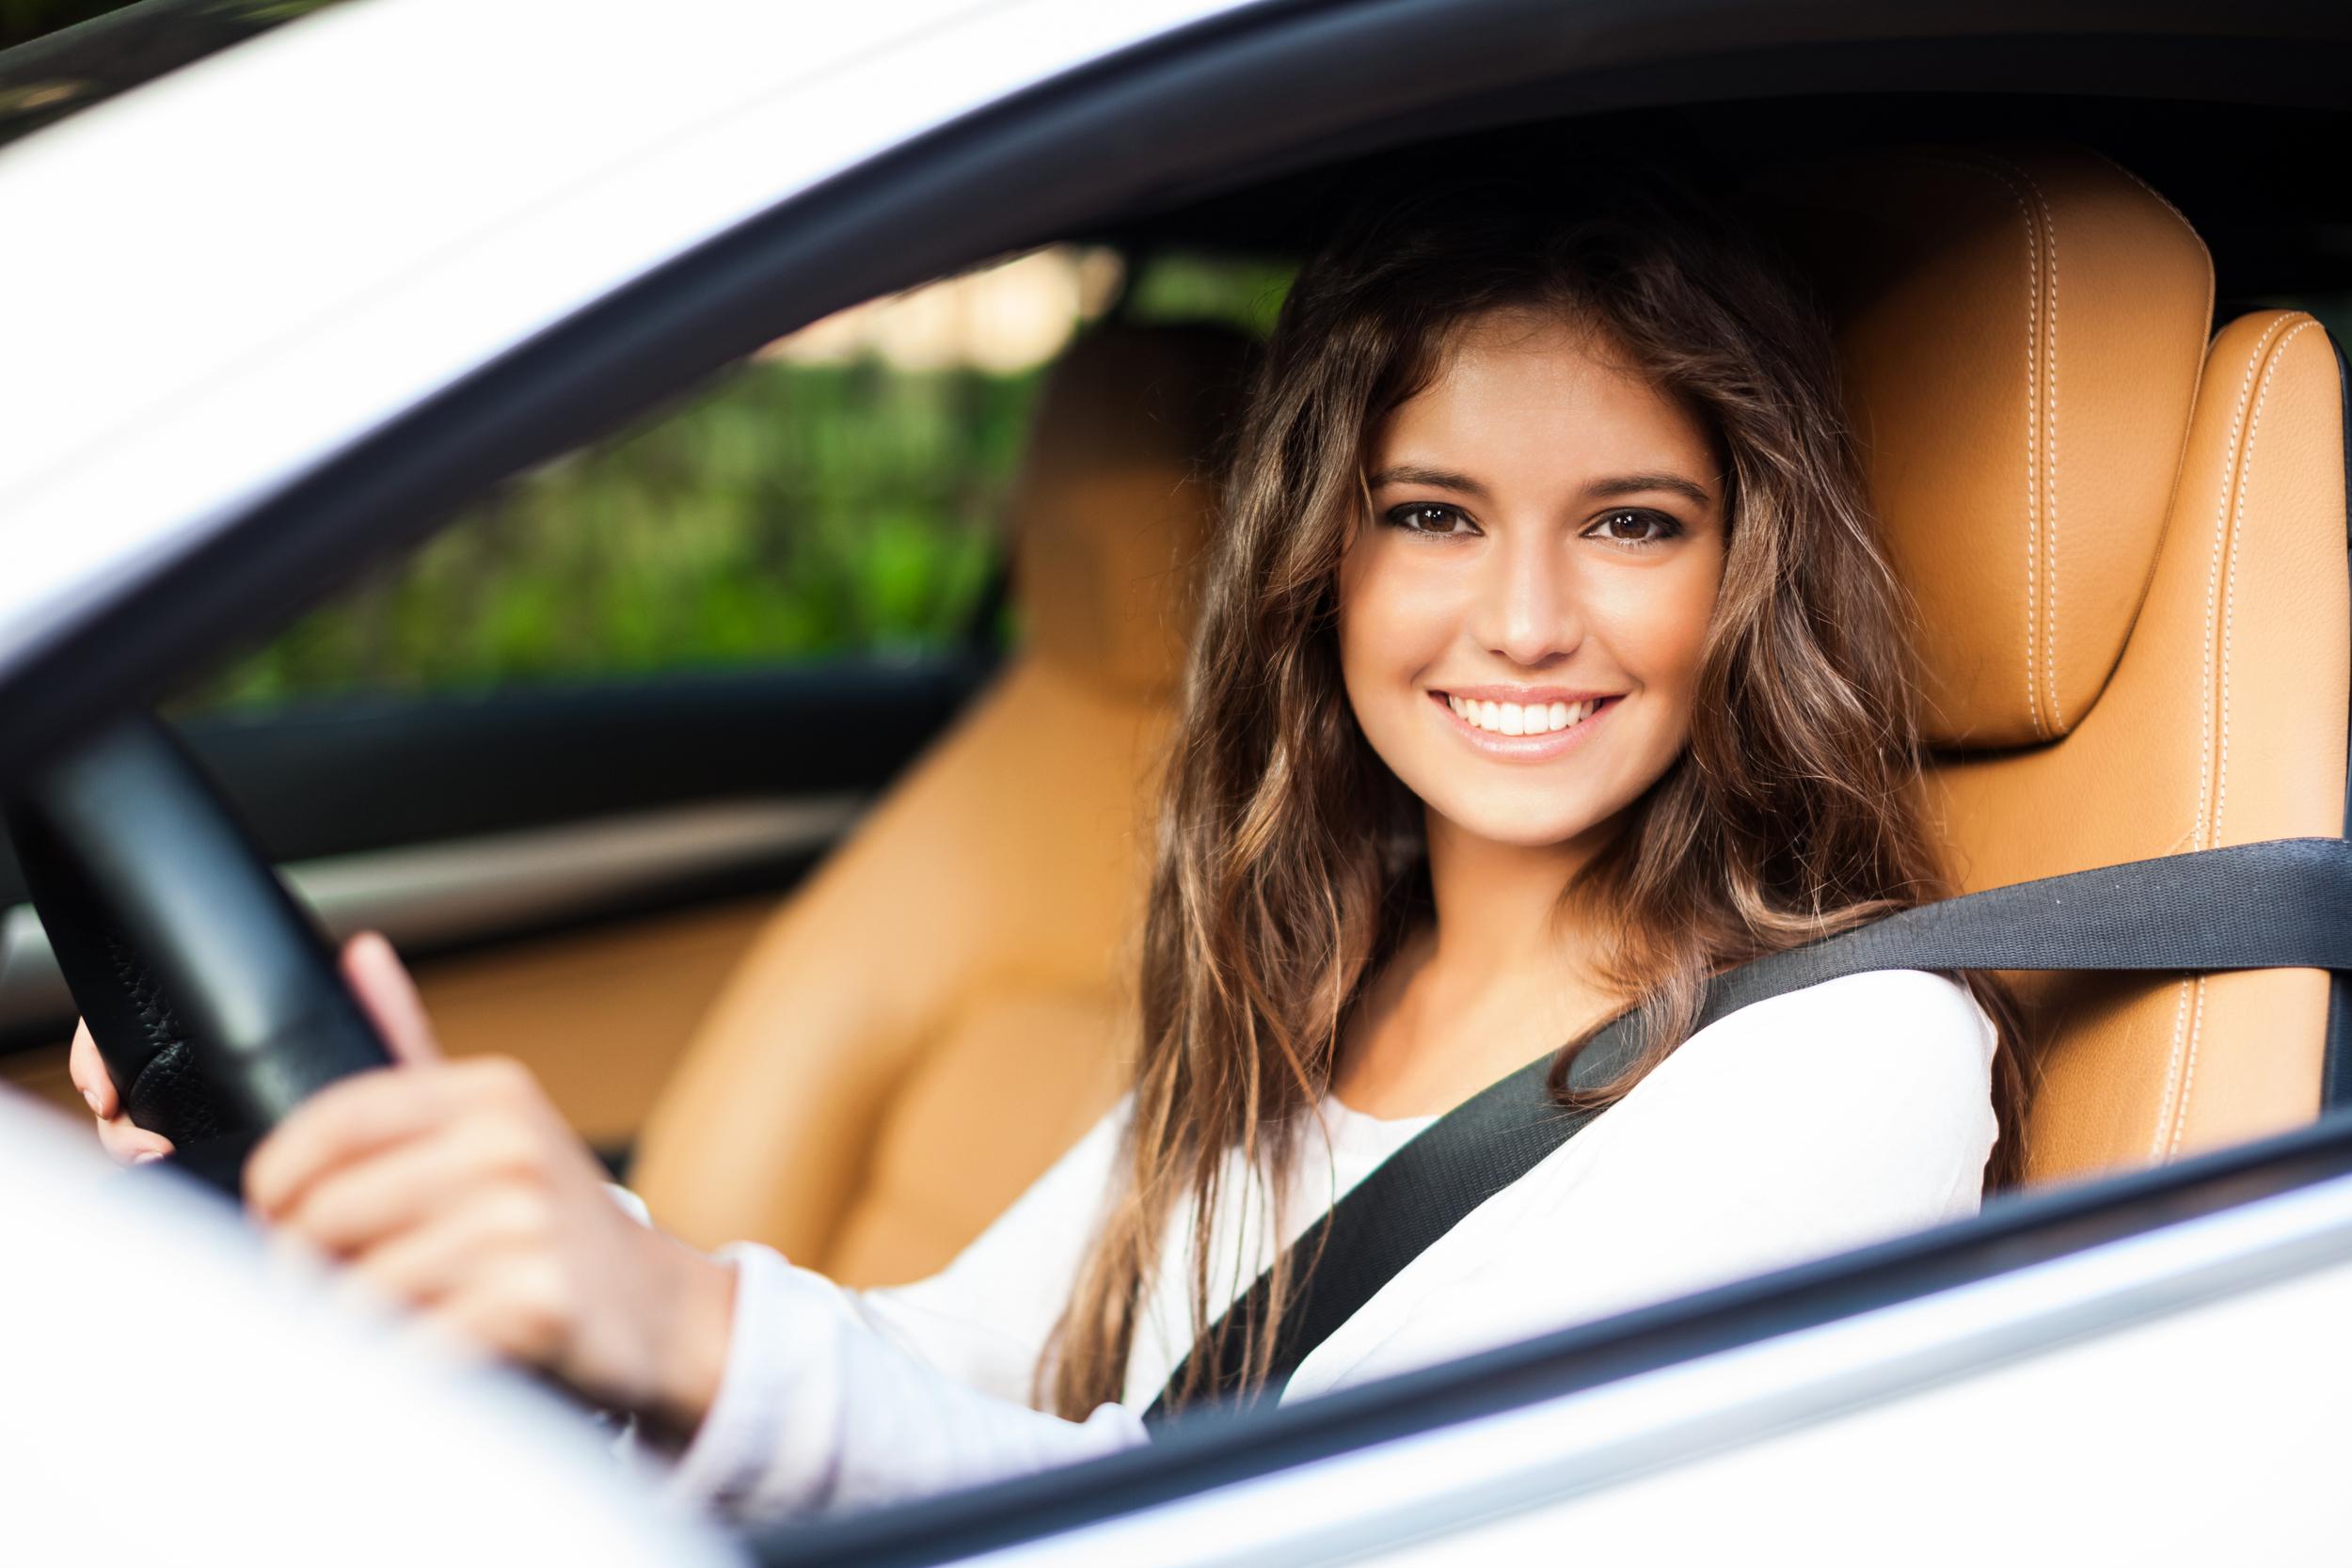 bigstock-Young-woman-driving-her-car-77893382.jpg